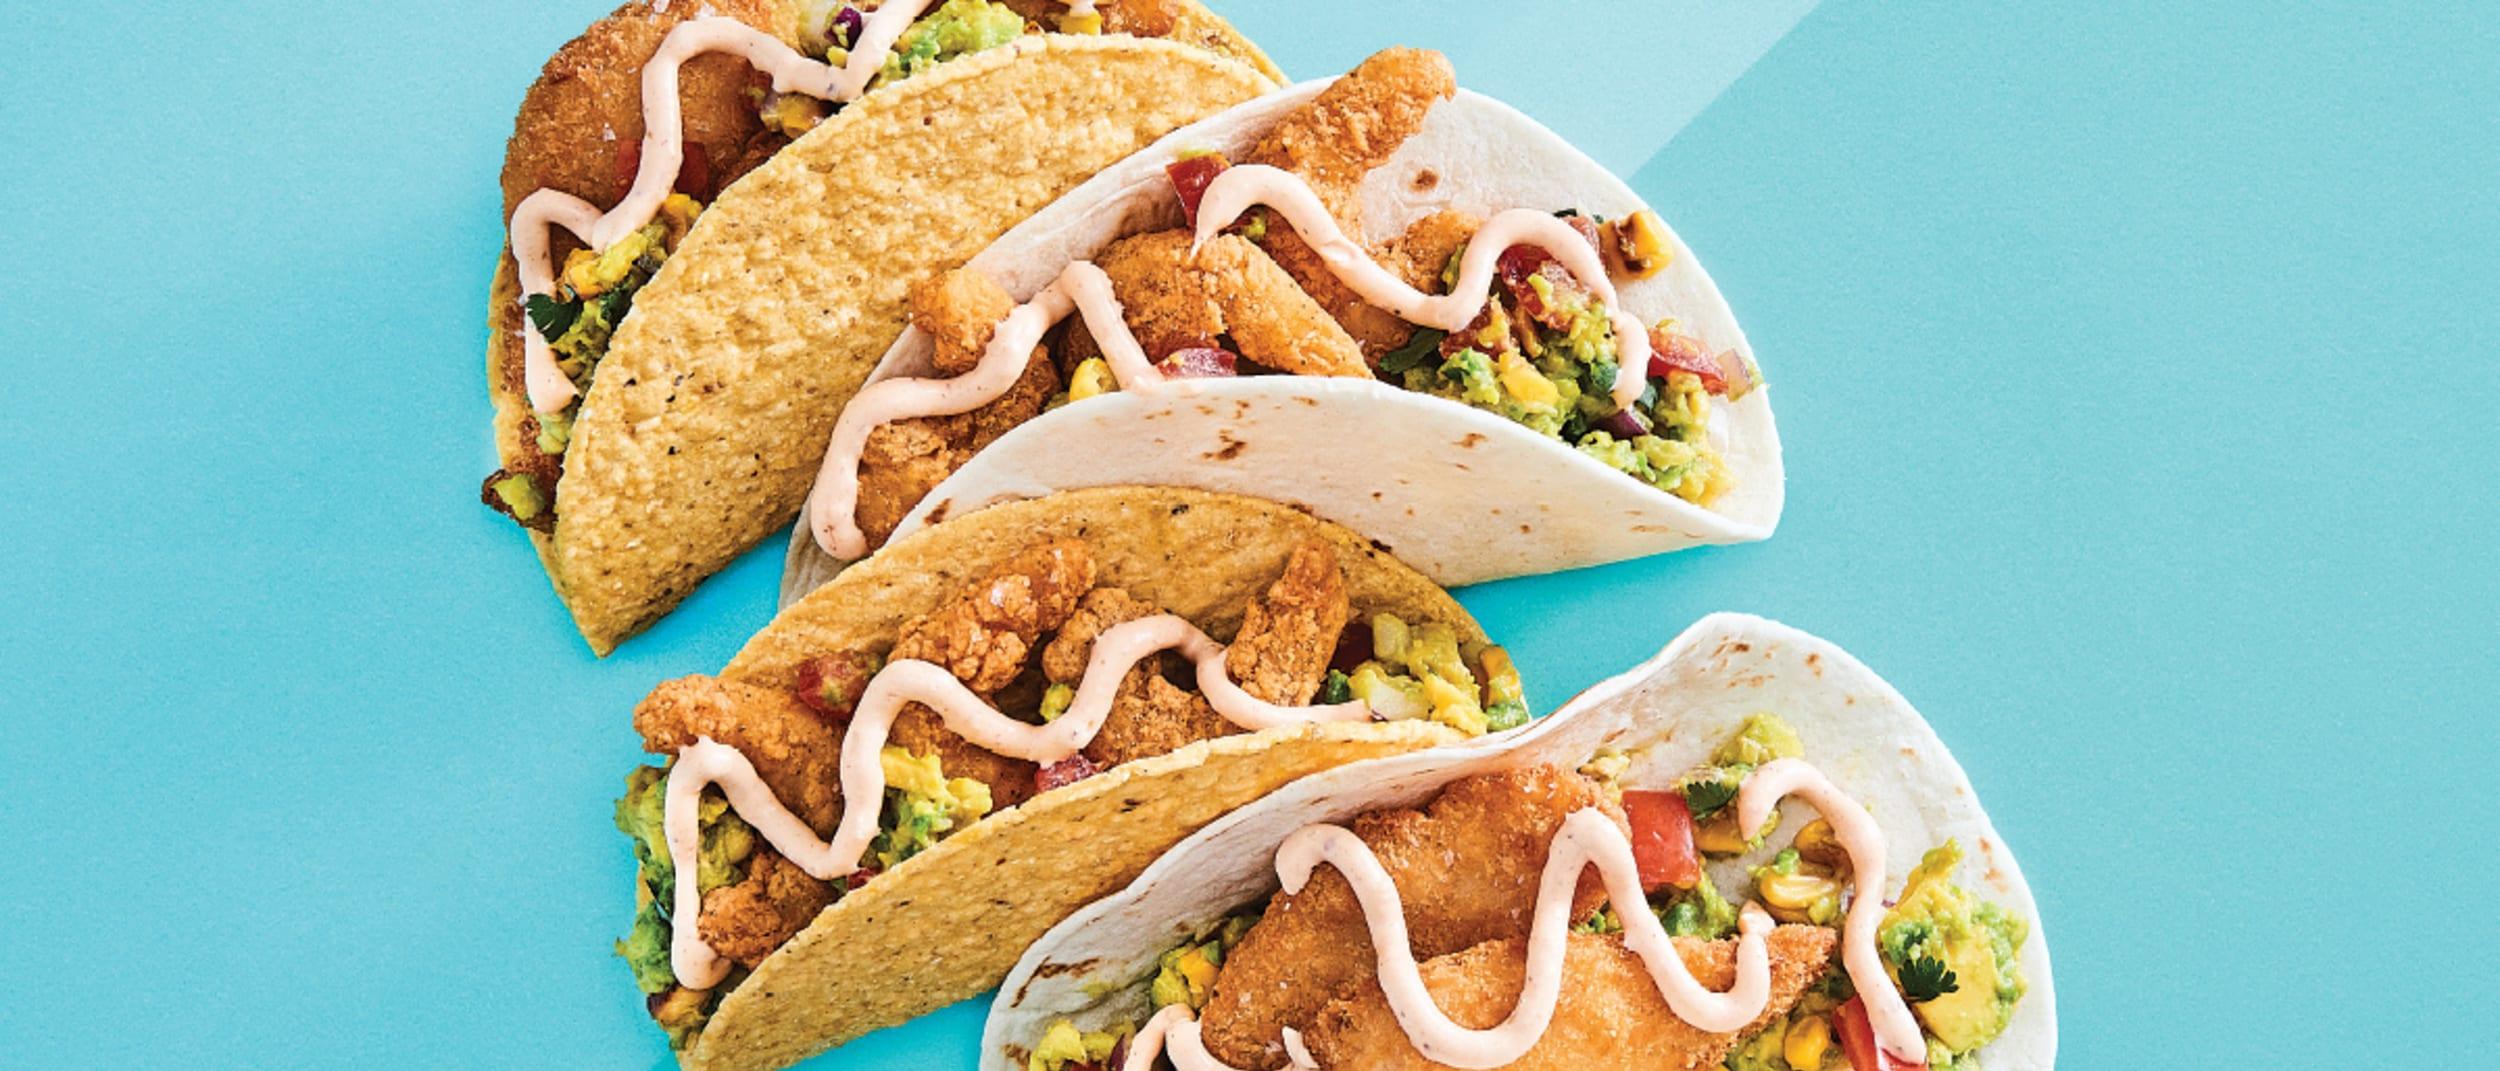 Salsa's Fresh Mex: Seafood Tacos